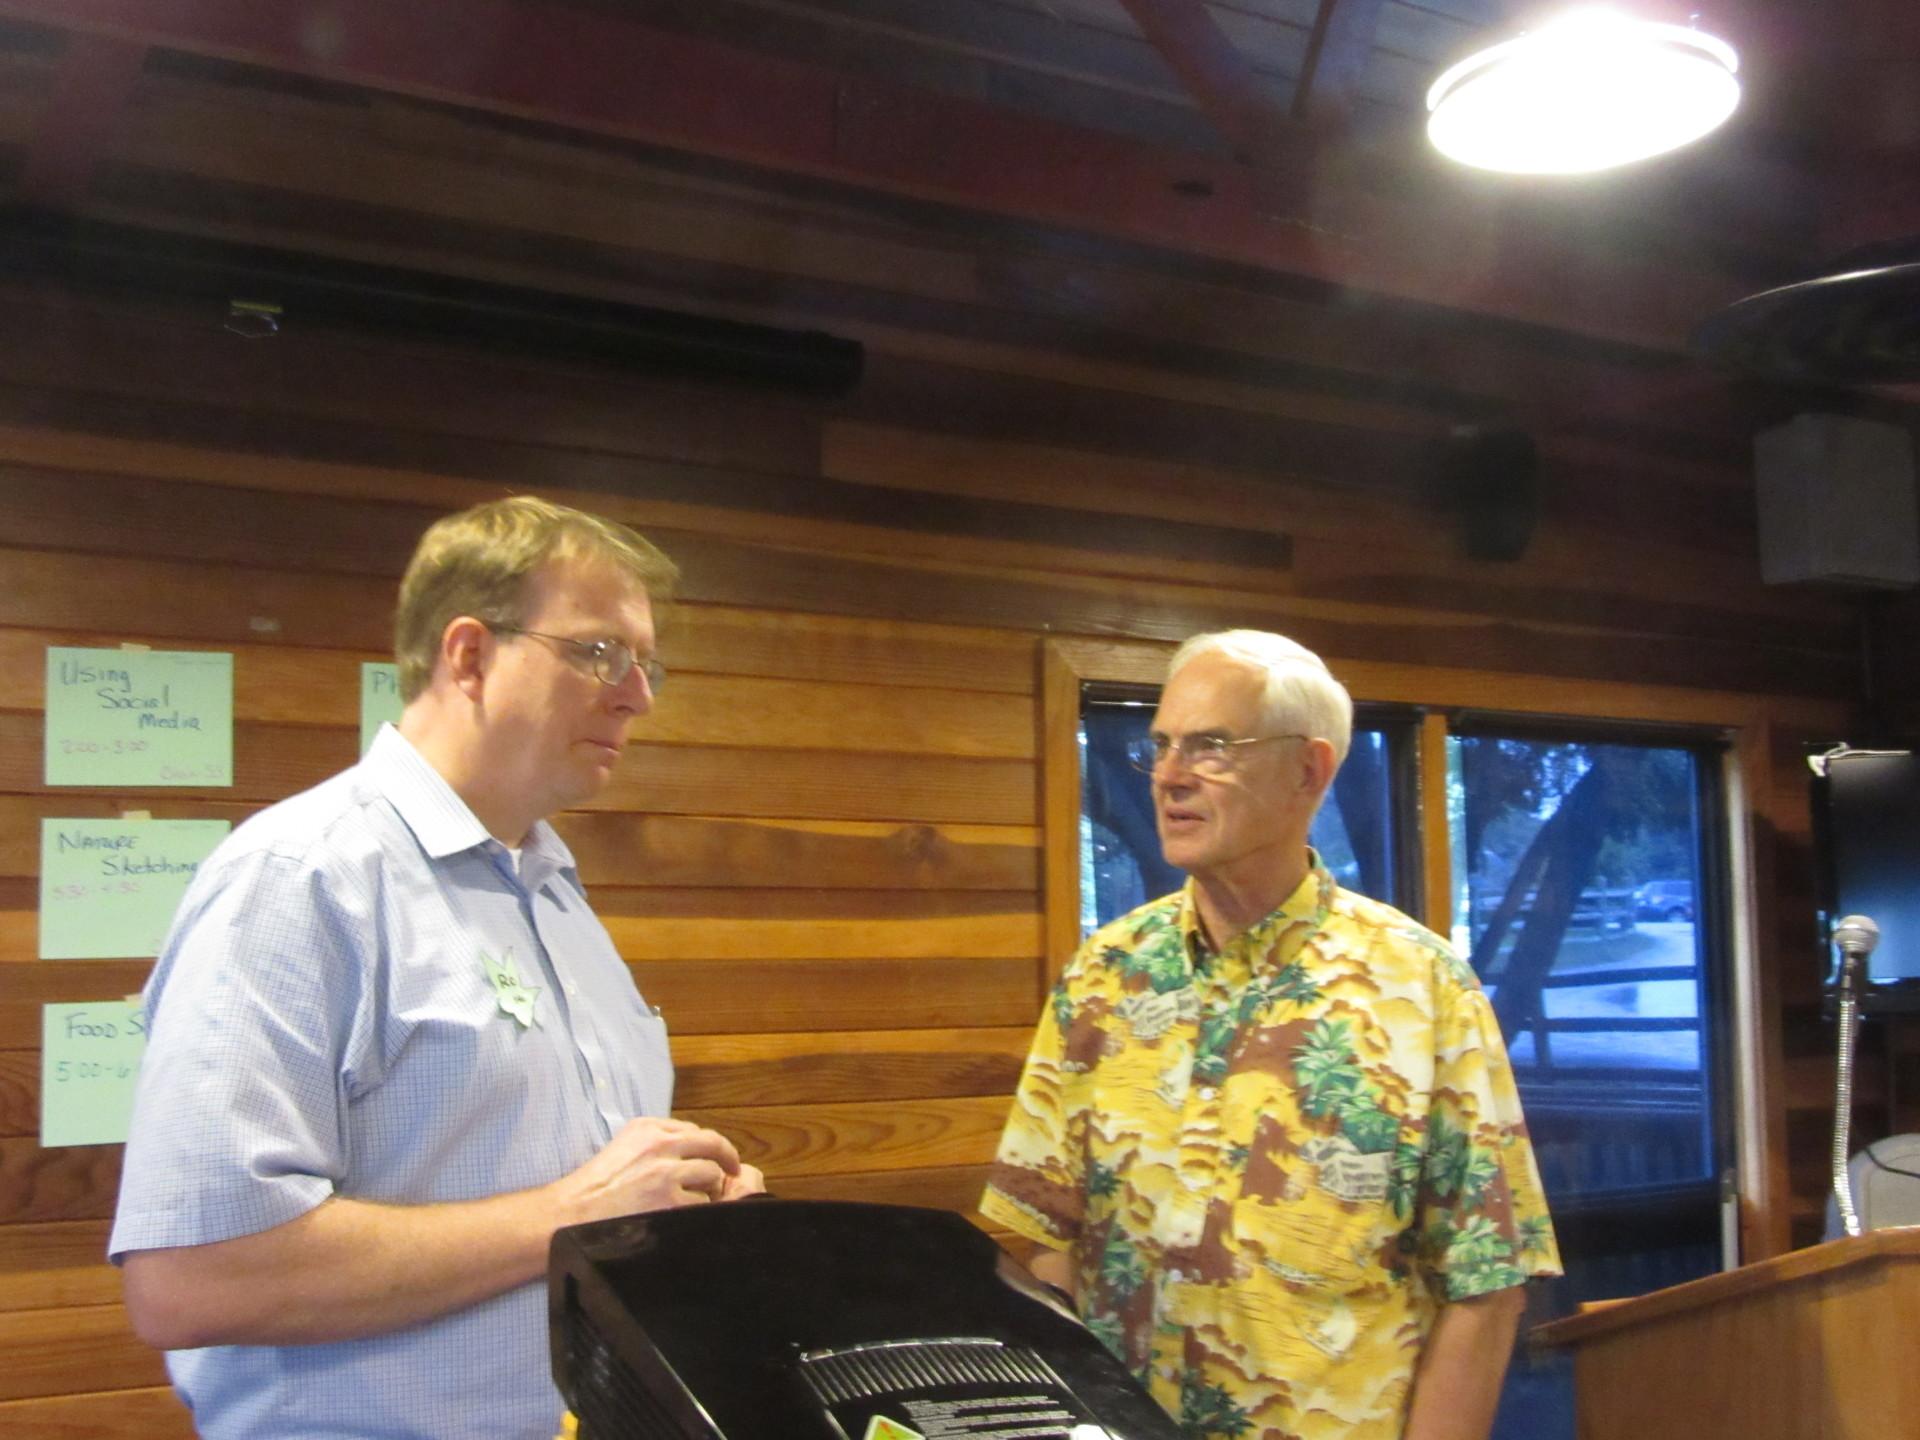 Iowa state senator Rob Hogg and Nebraska state senator Ken Haar compare climate realities that have no political boundaries.